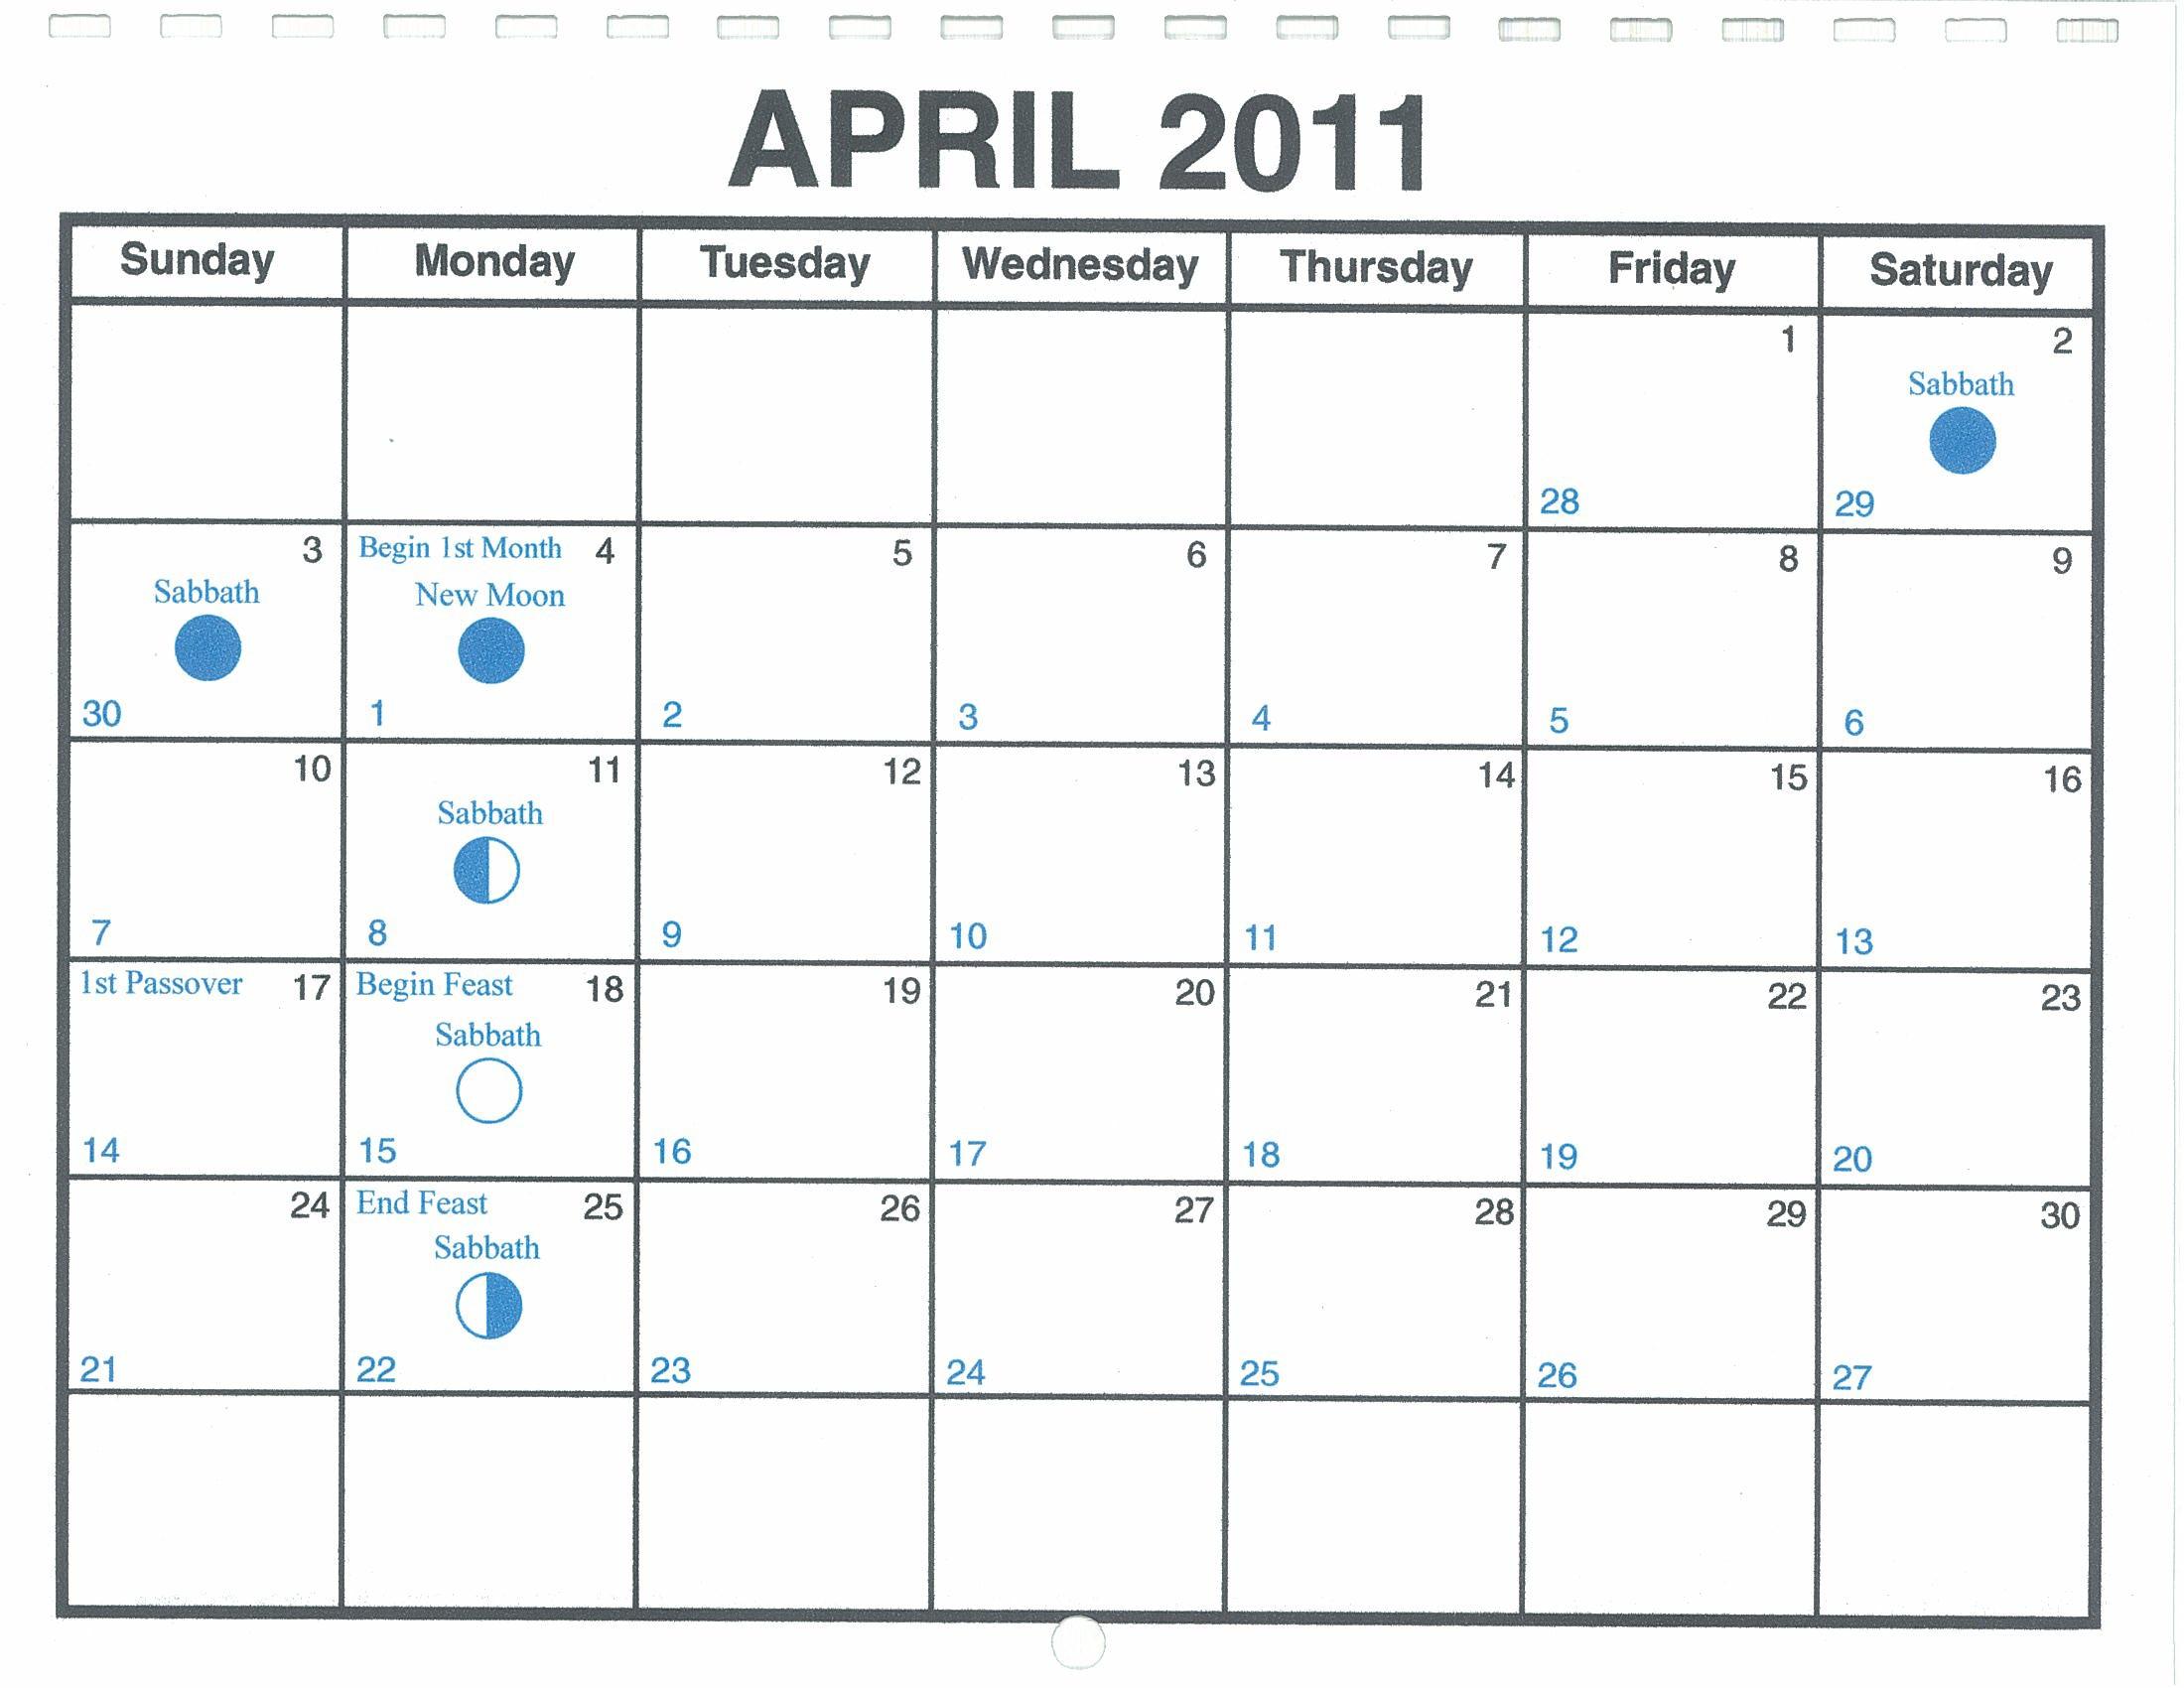 Calendar April 2011 : April lunar calendar — one yahweh